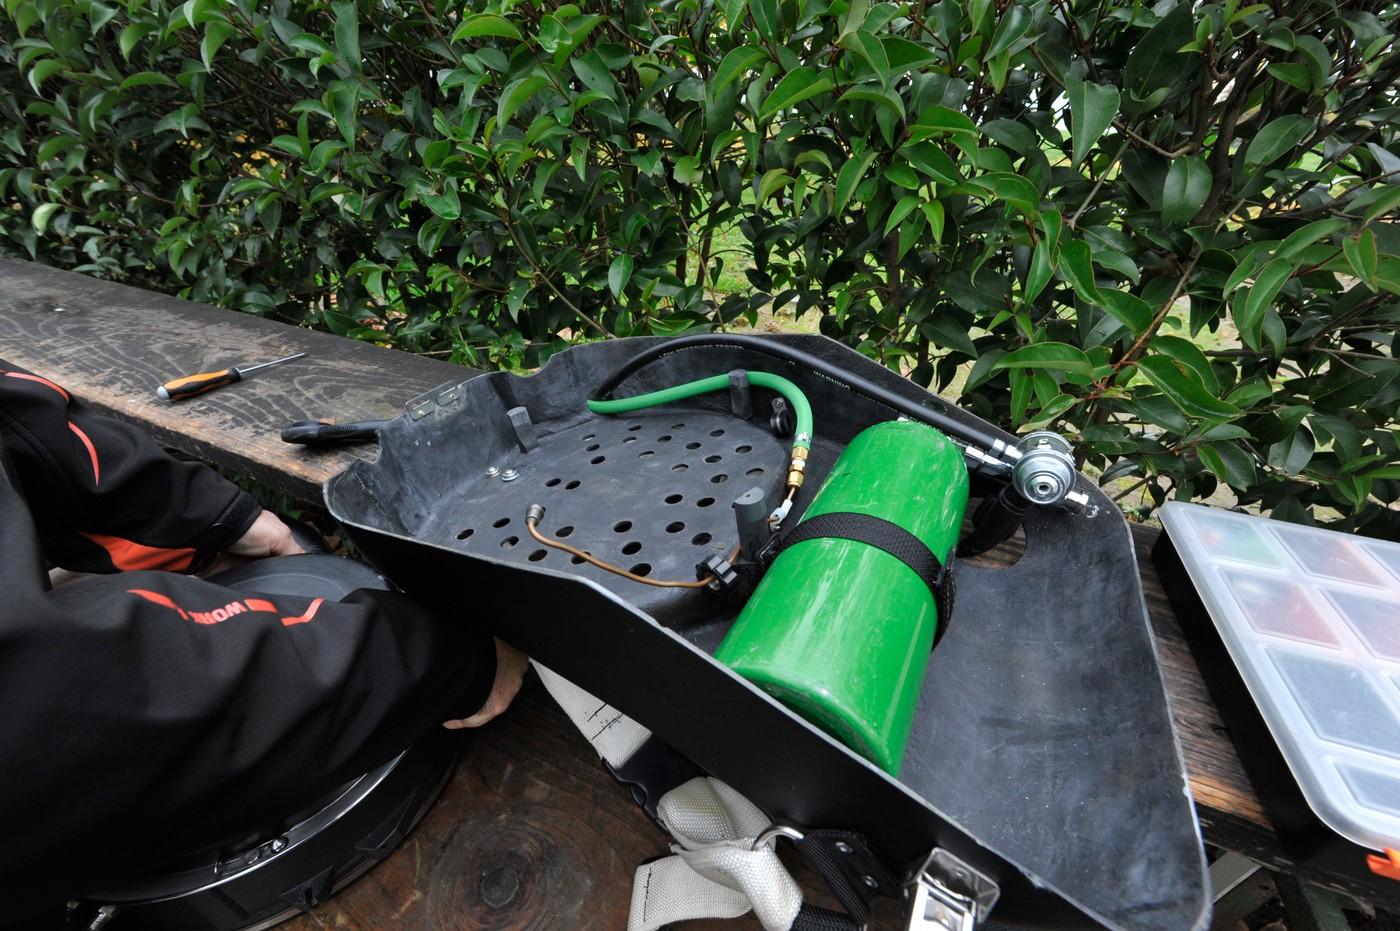 plongée recycleuse et oxydante à Hermance _DSC5928web